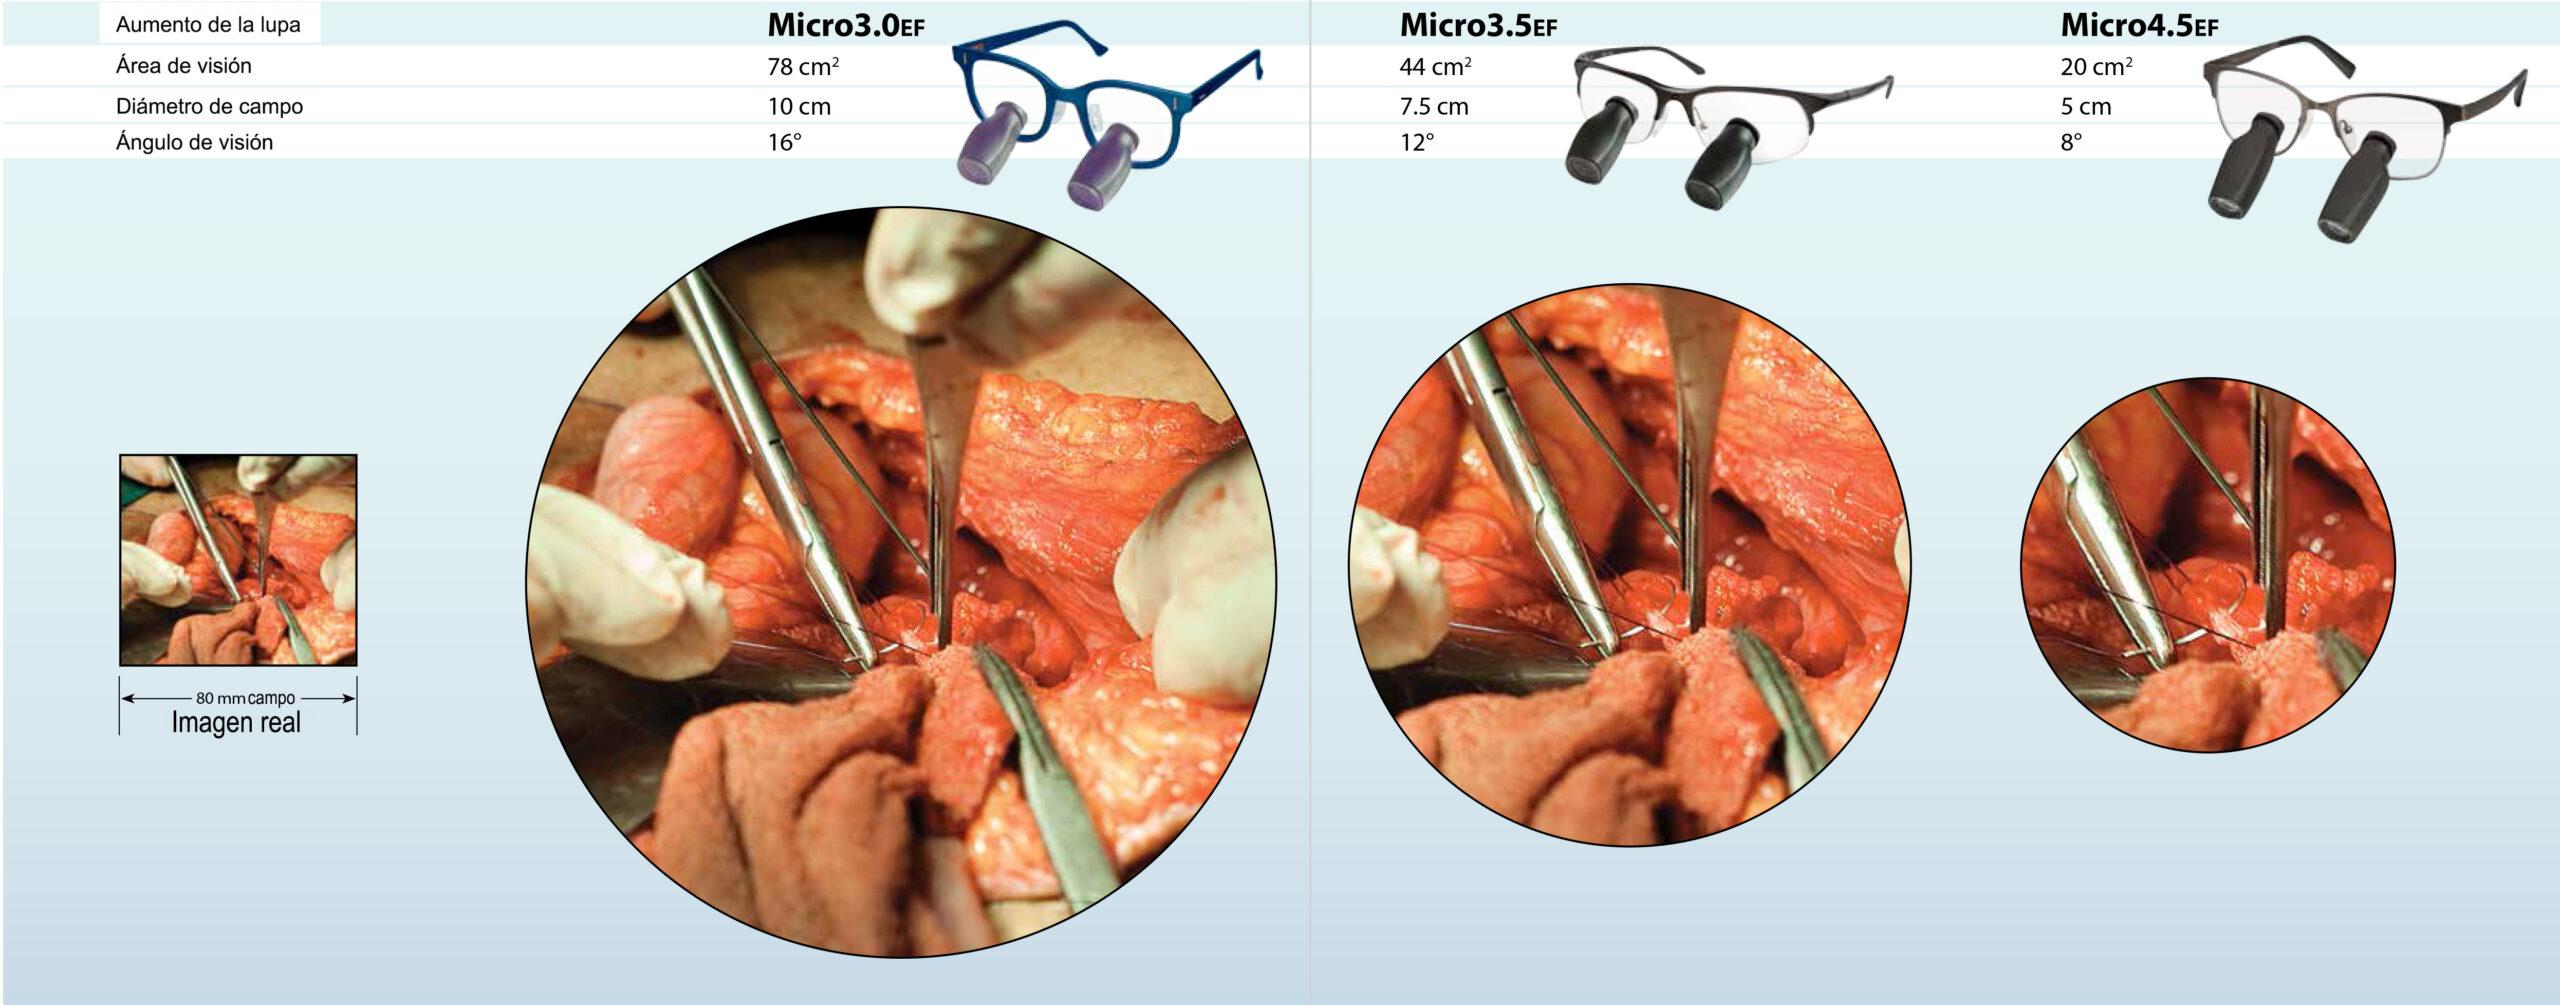 CirujanoSerieMicro_DFV_AVS